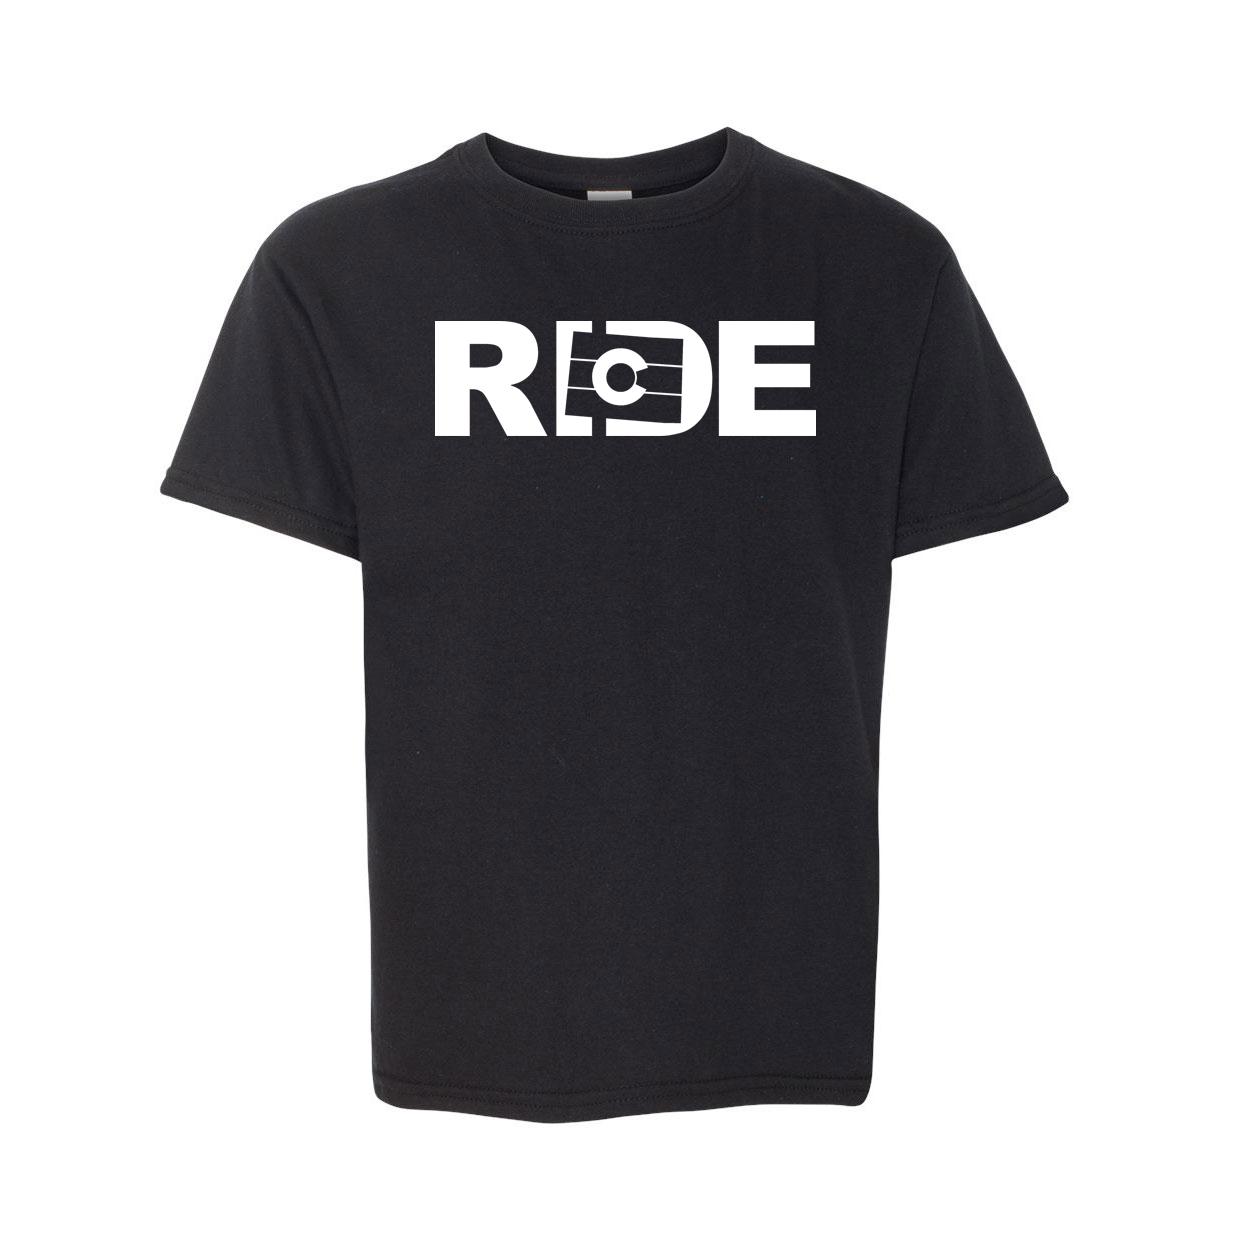 Ride Colorado Classic Youth T-Shirt Black (White Logo)